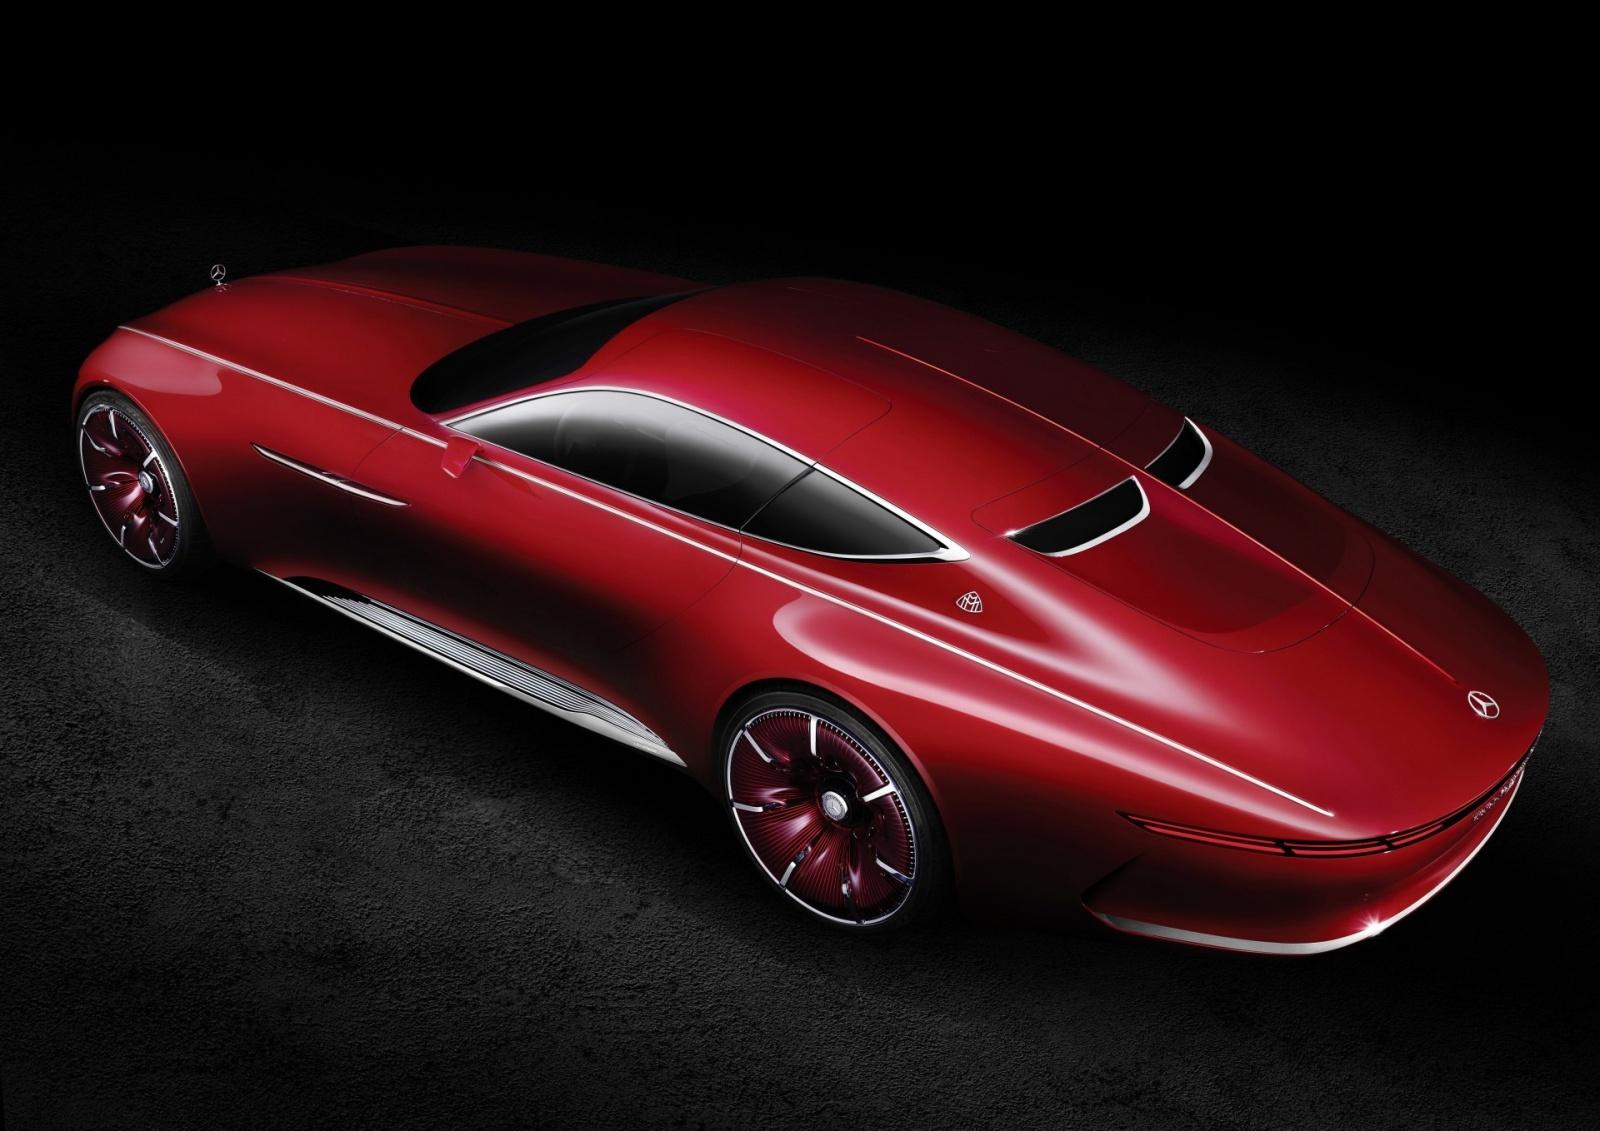 Проект шестиметрового электрокара Vision Mercedes-Maybach 6 - 5